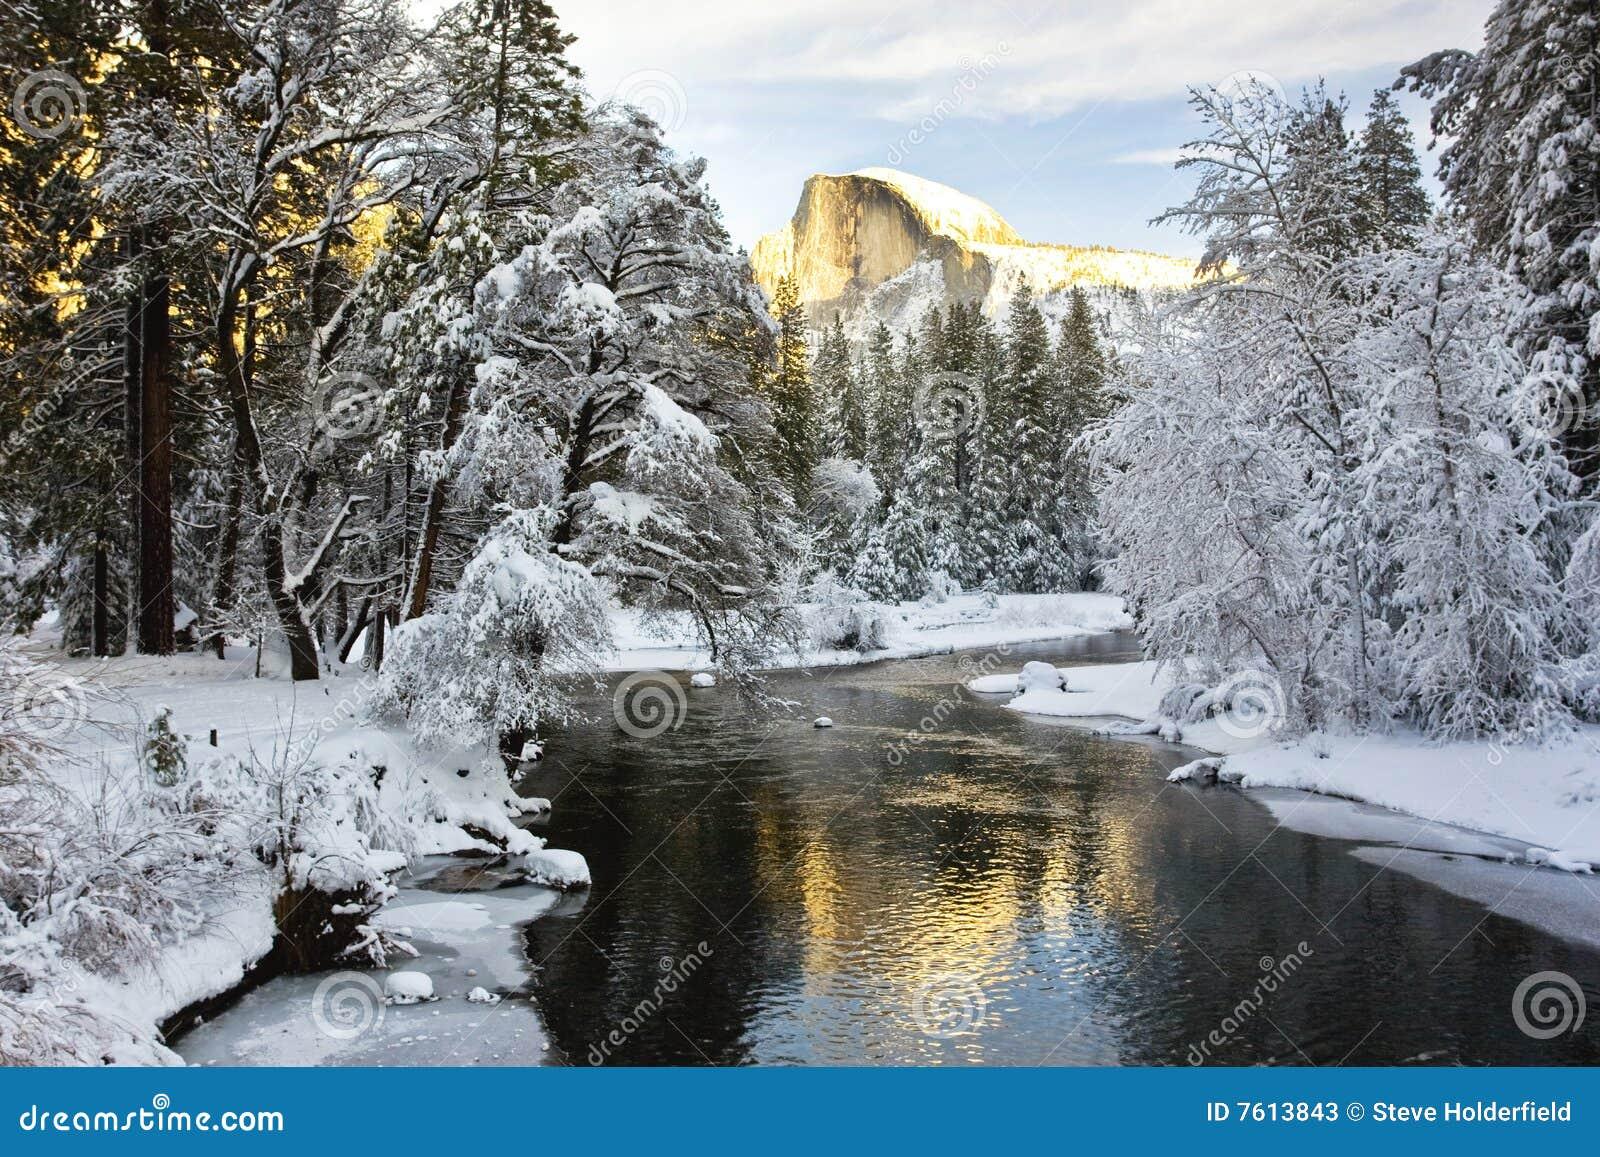 Half Dome over a frozen Merced River